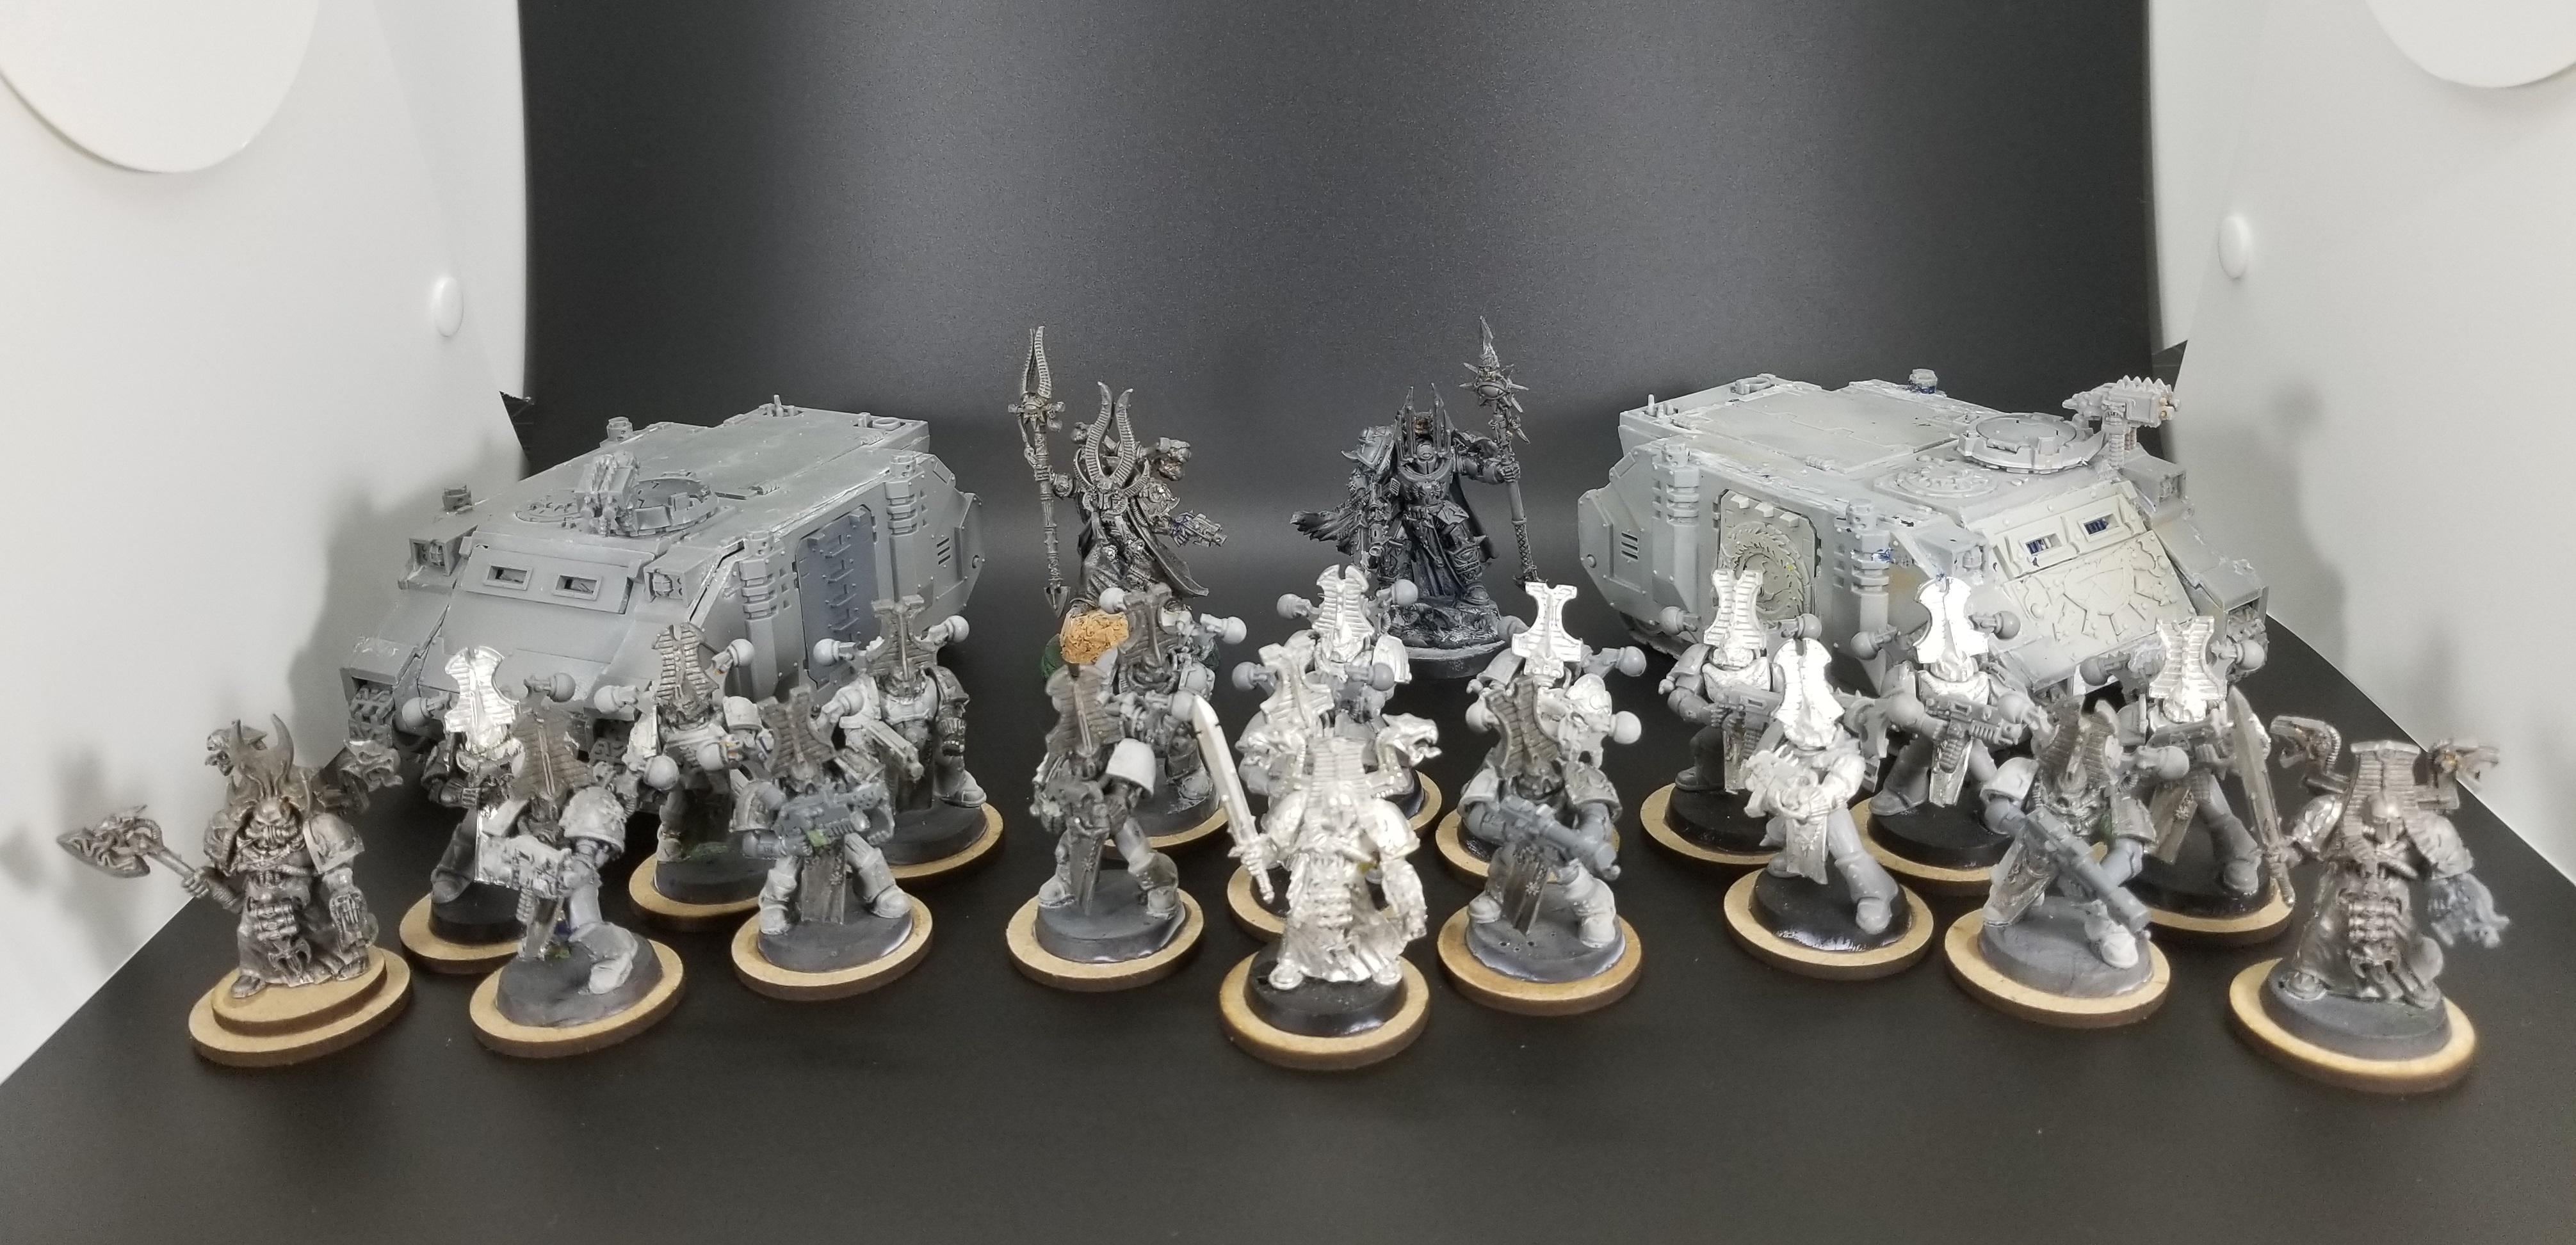 Ahriman, Chaos, Lord, Rhino, Rubric Marines, Thousand Sons, Tzeentch, Work In Progress